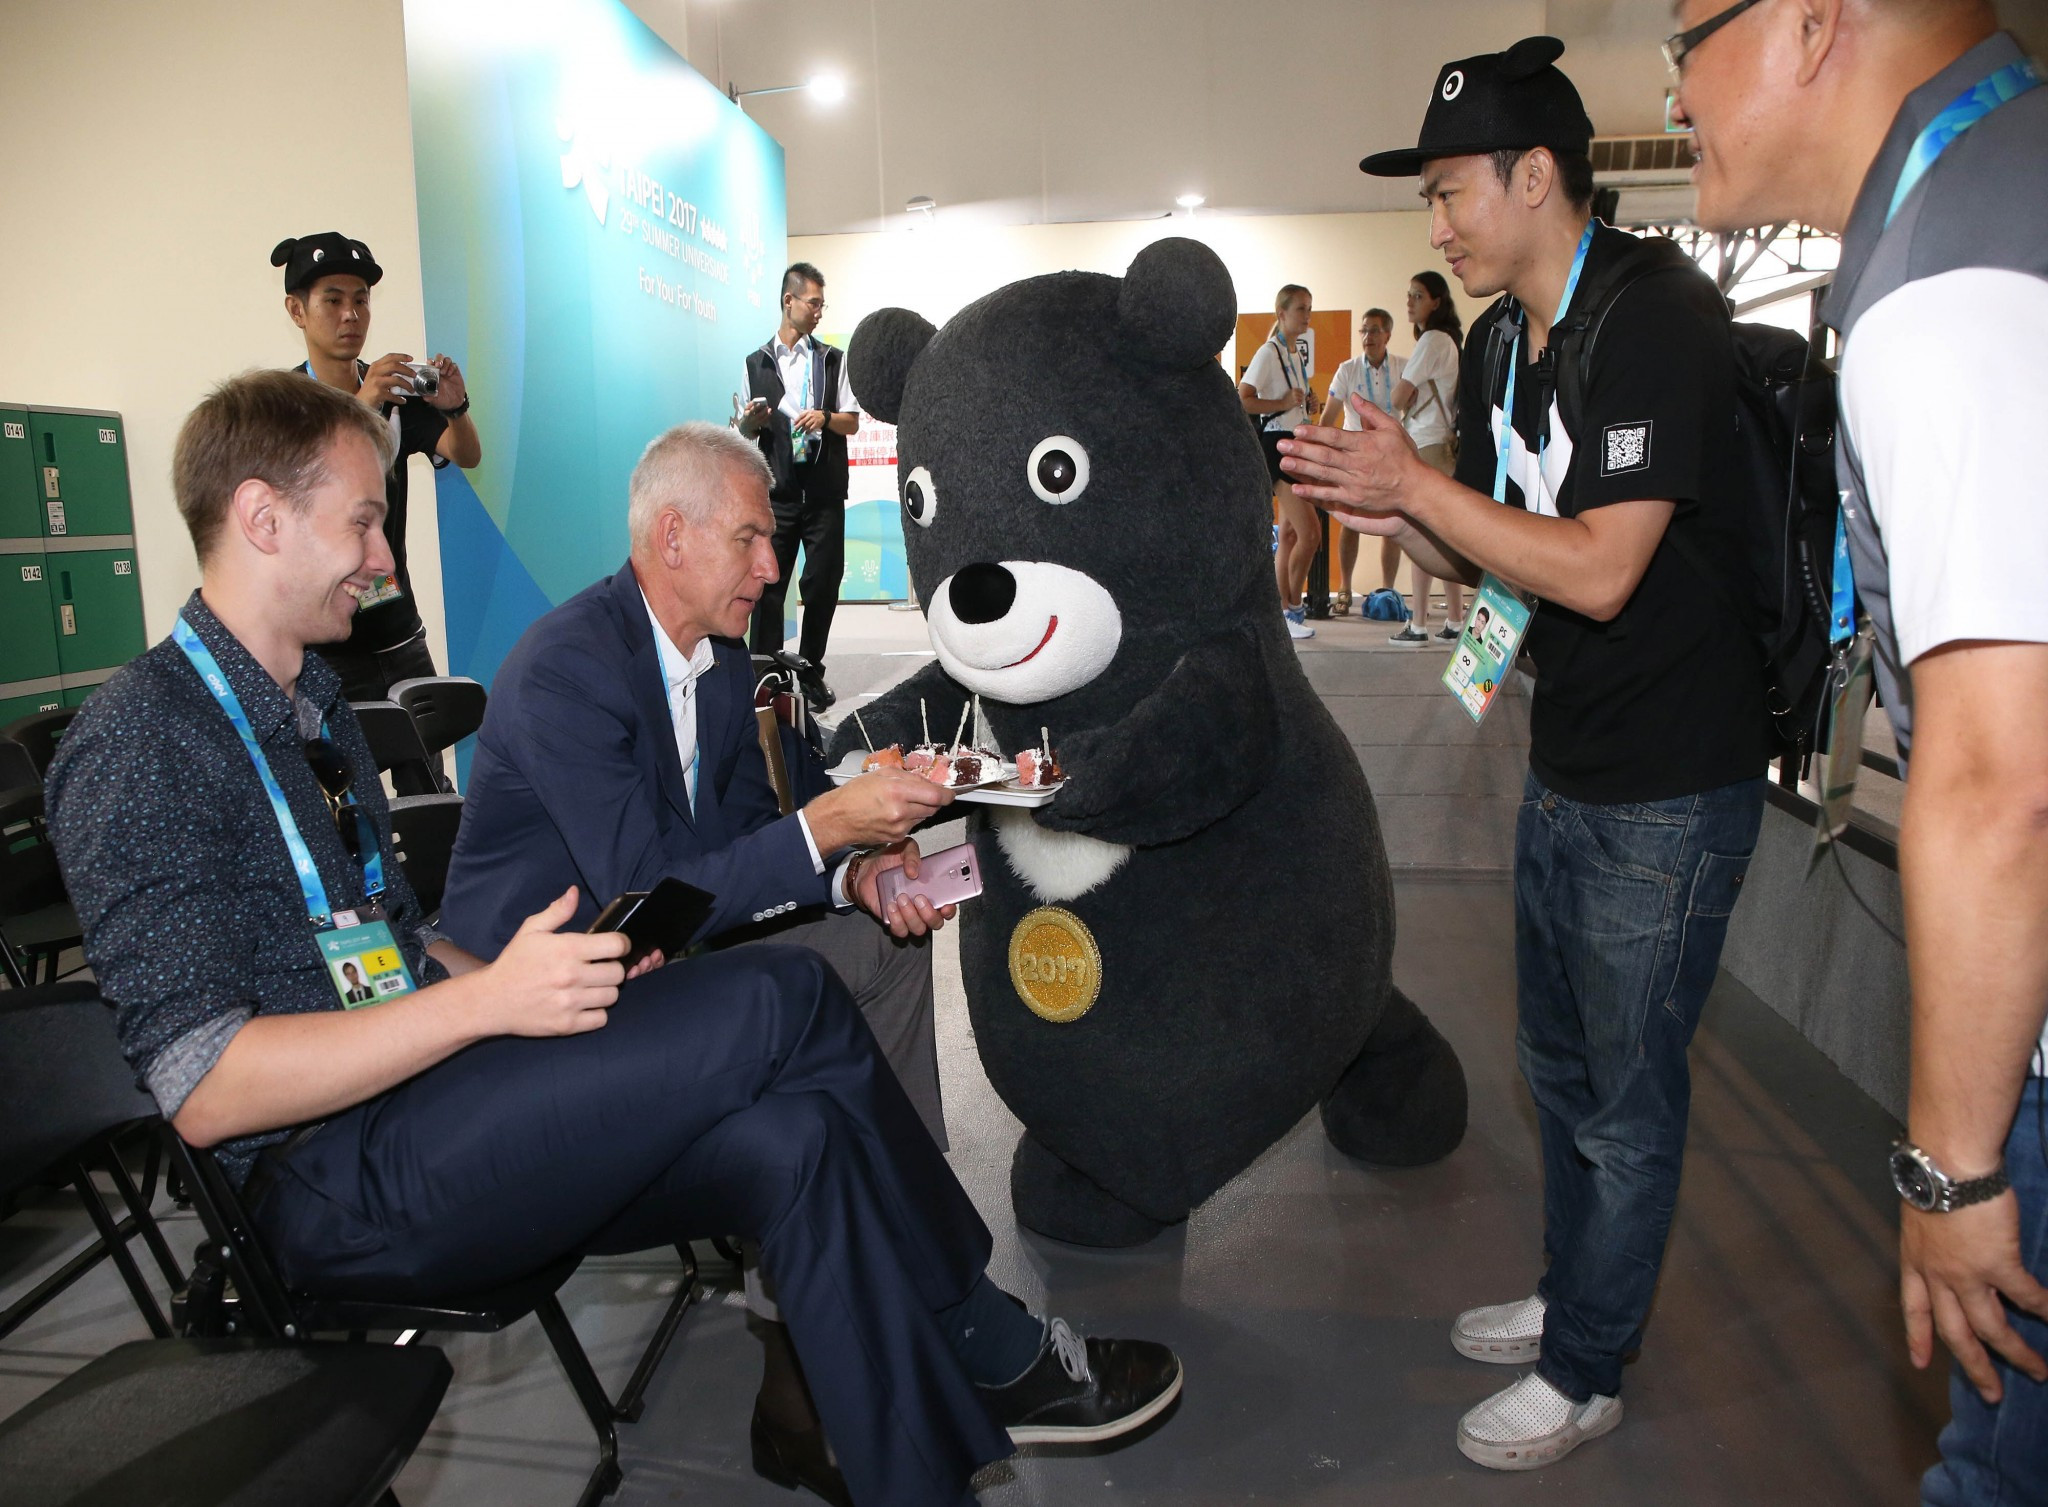 Bravo is based on the Formosan black bear ©Taipei 2017